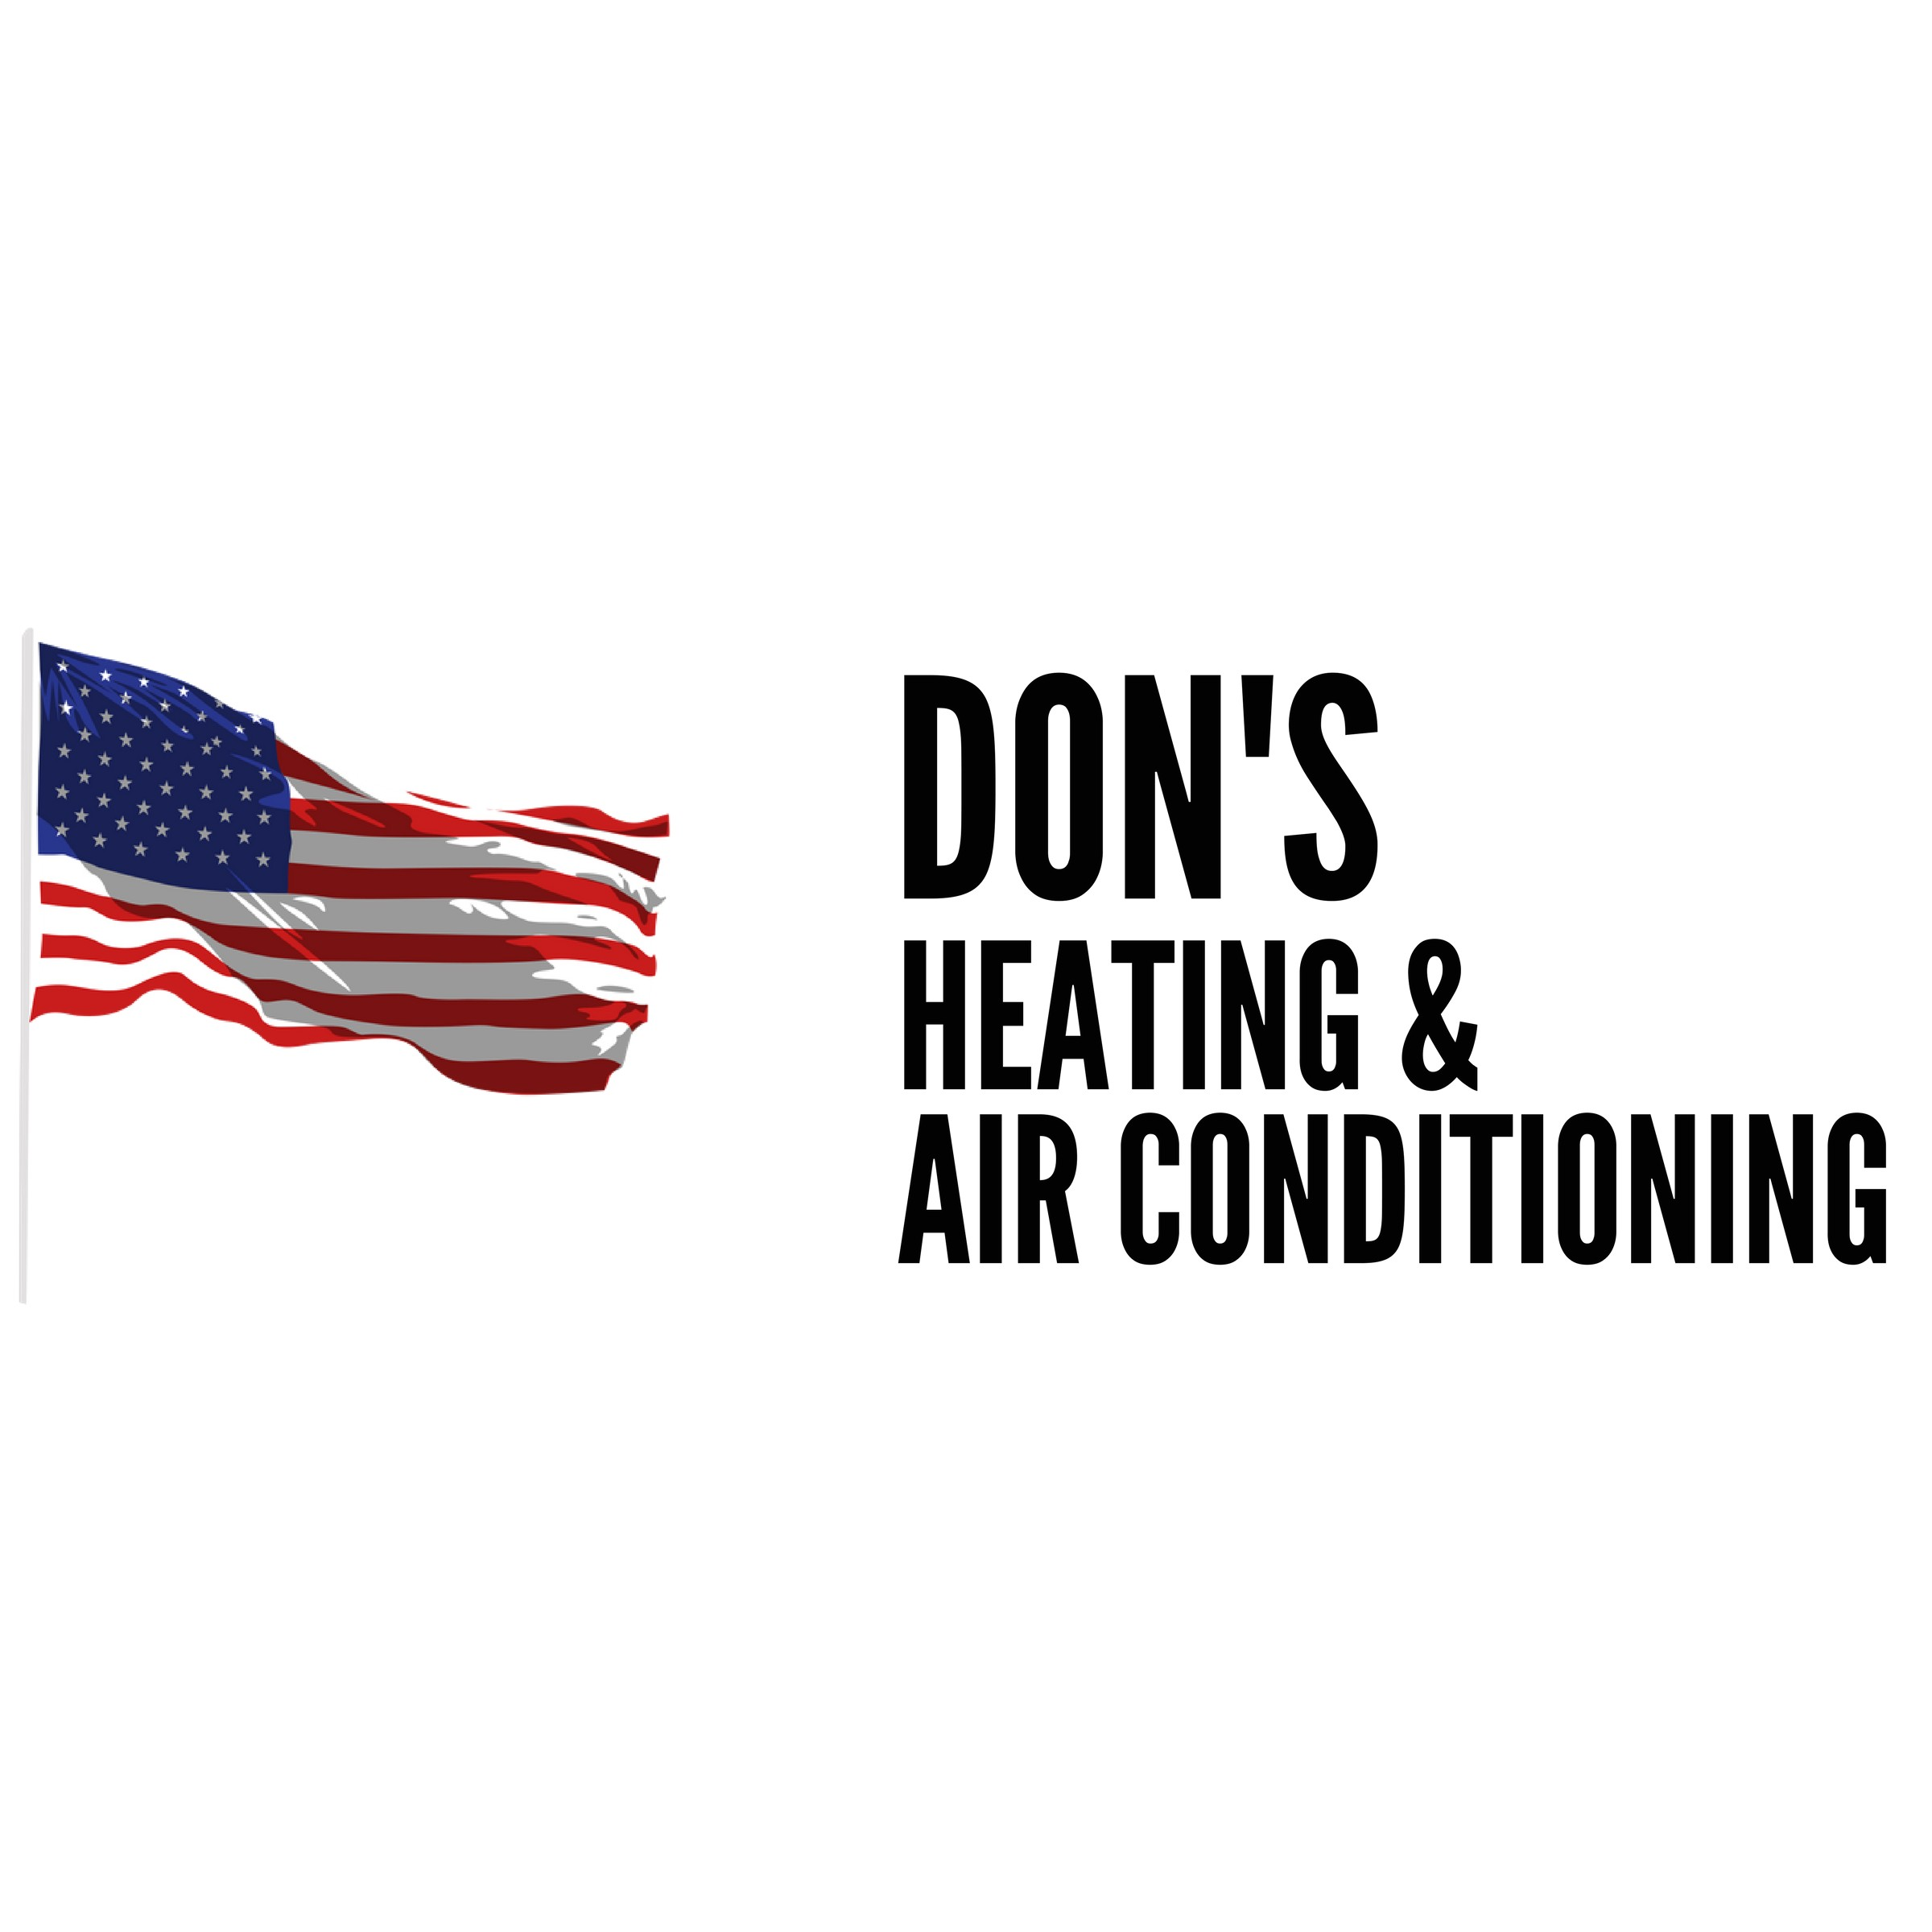 donsheatingairconditioning santabarbara ca 24288447